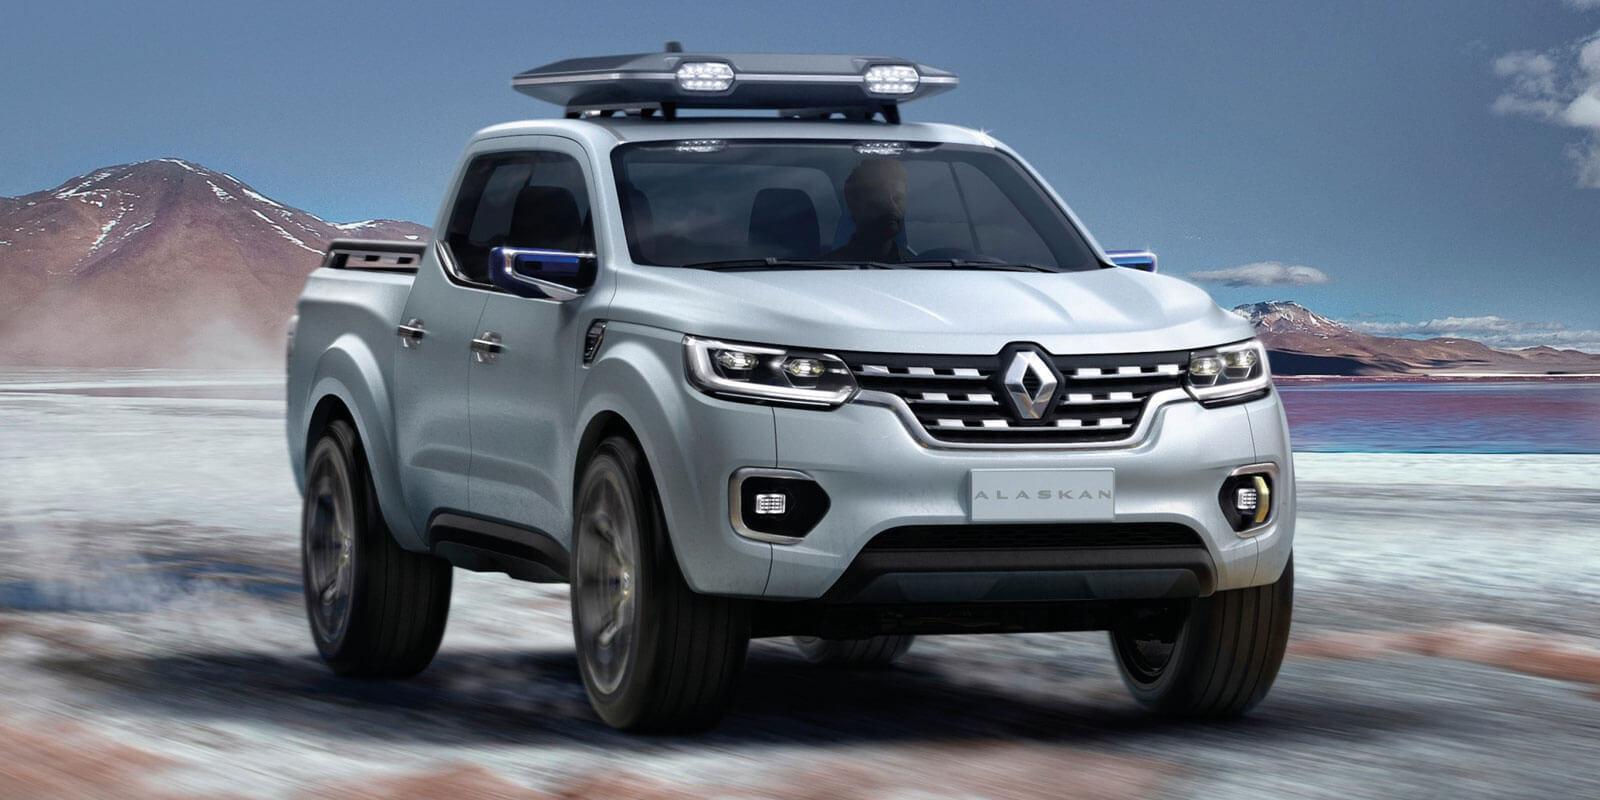 Renault Alaskan Concept Lower Image on Jeep Wrangler Renegade Concept